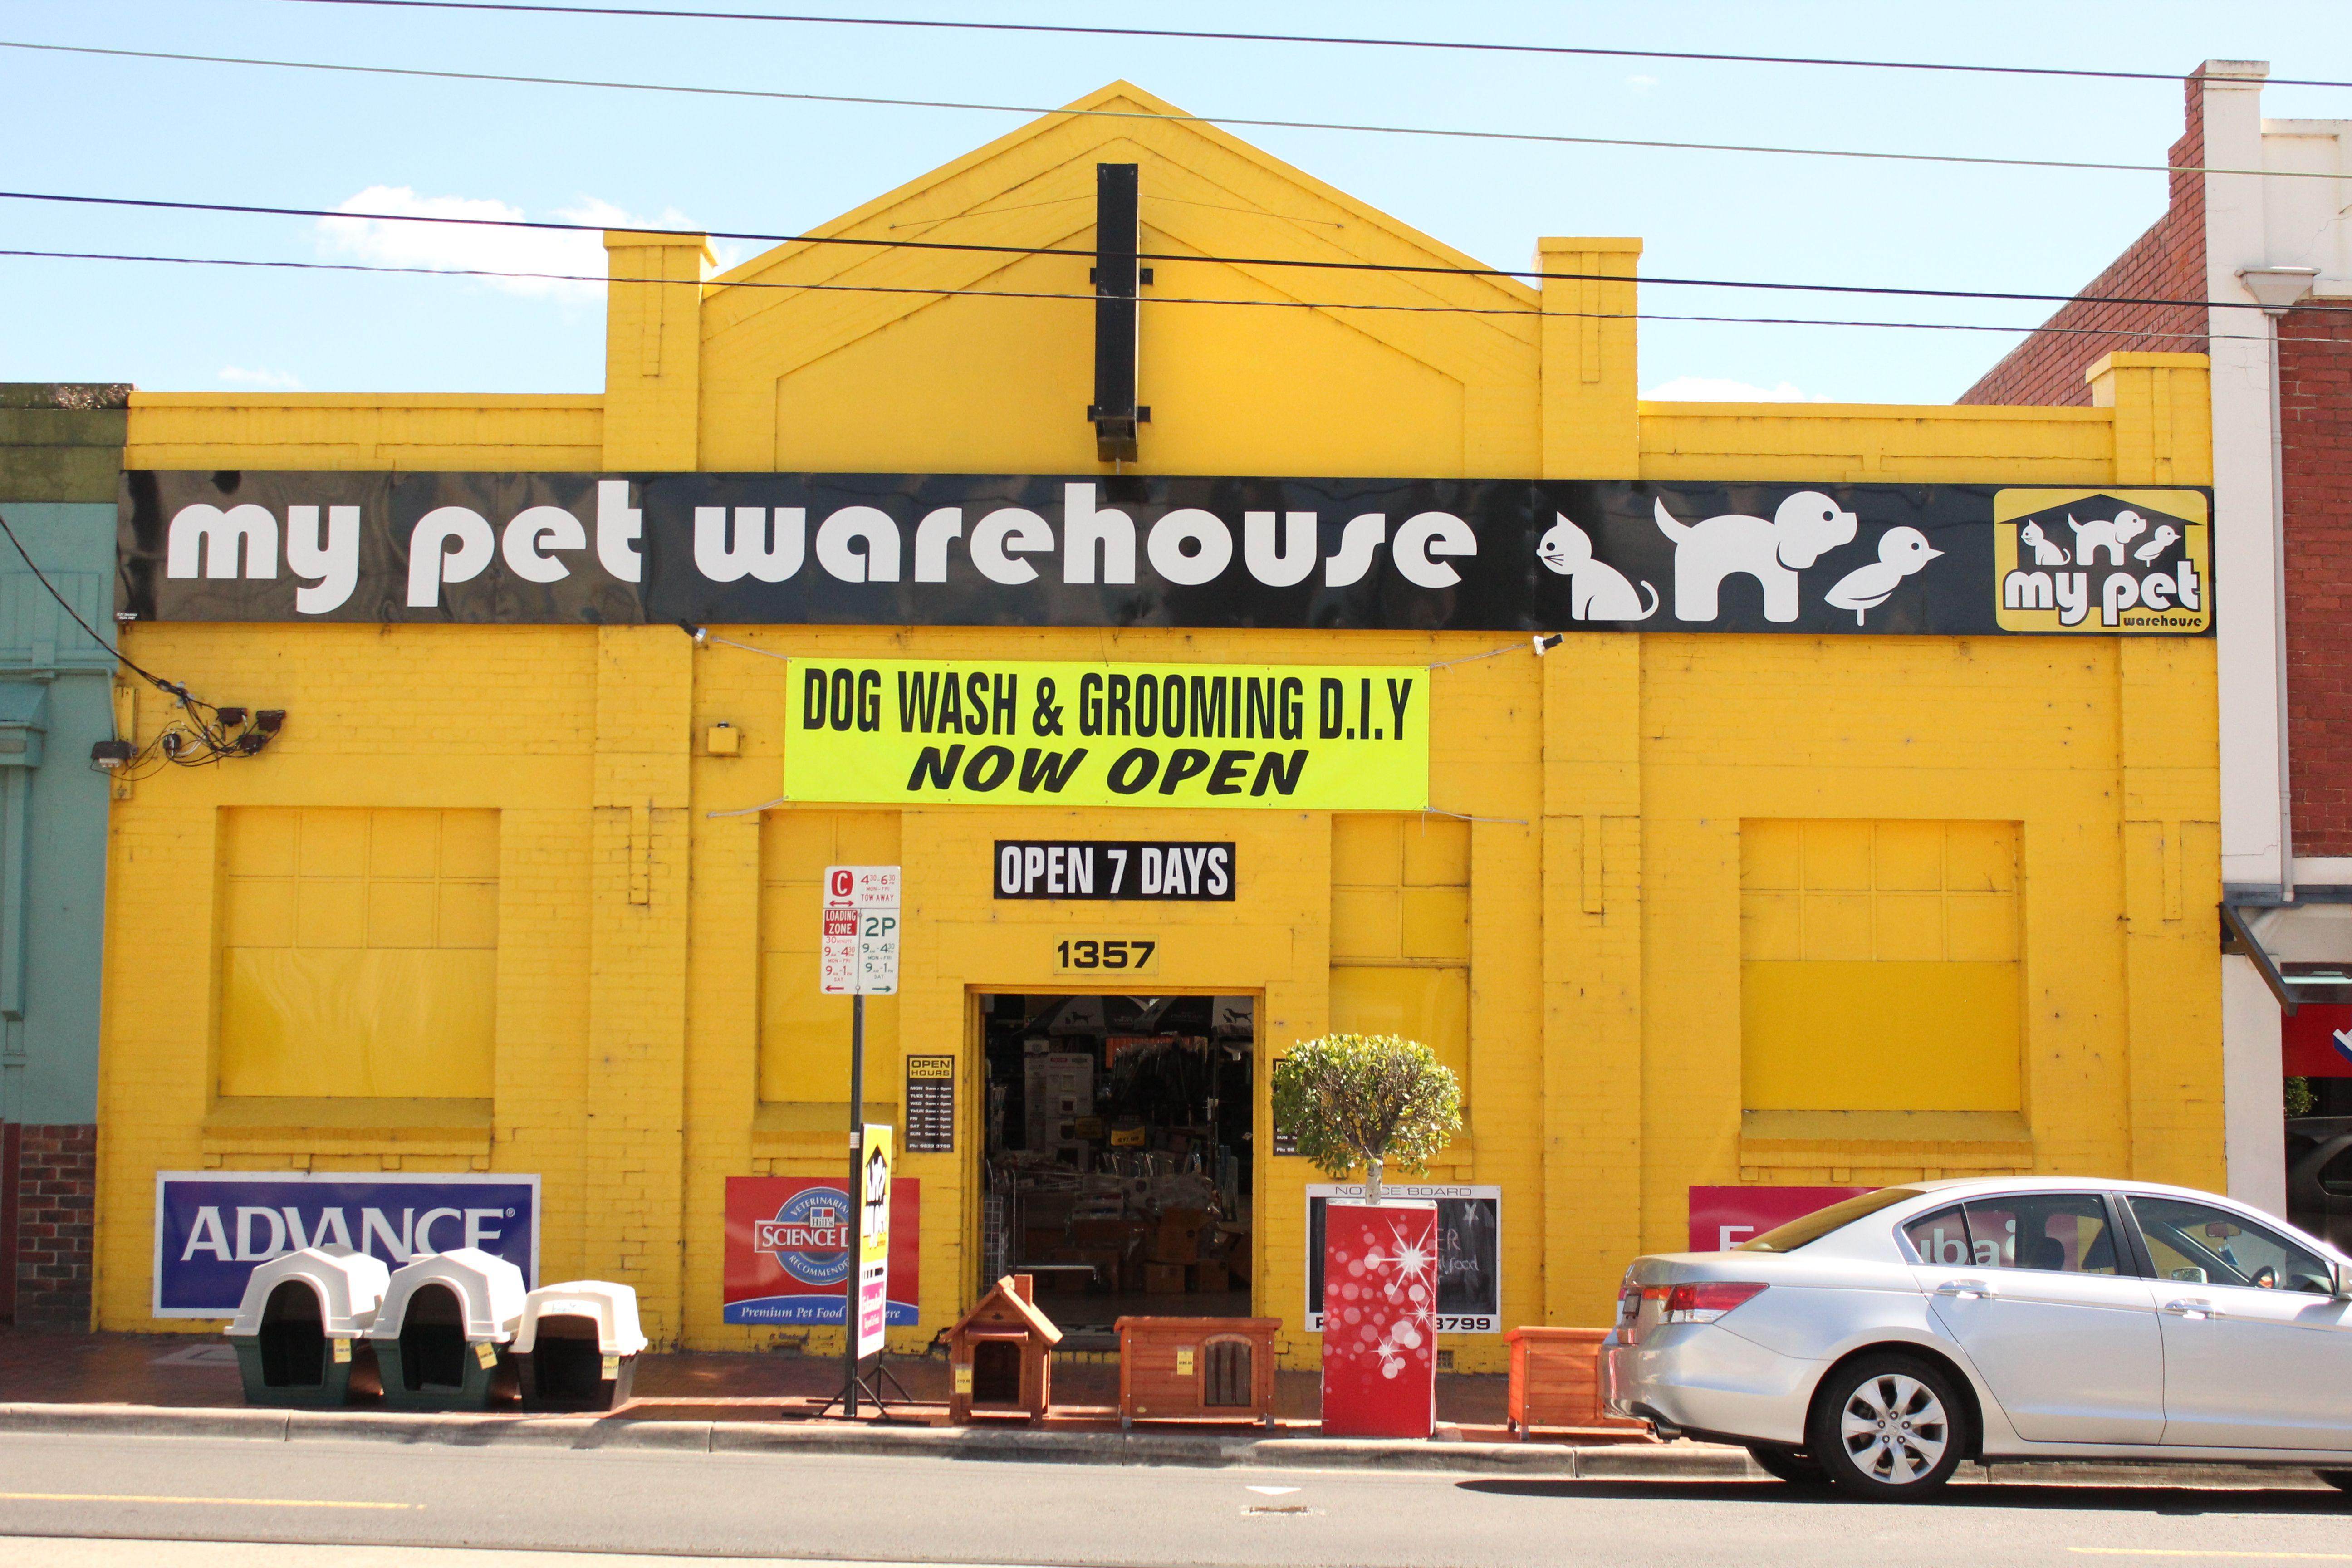 My Pet Warehouse Malvern 1357 Malvern Road Malvern Victoria 3144 Pet Warehouse Pets My Pet Dog